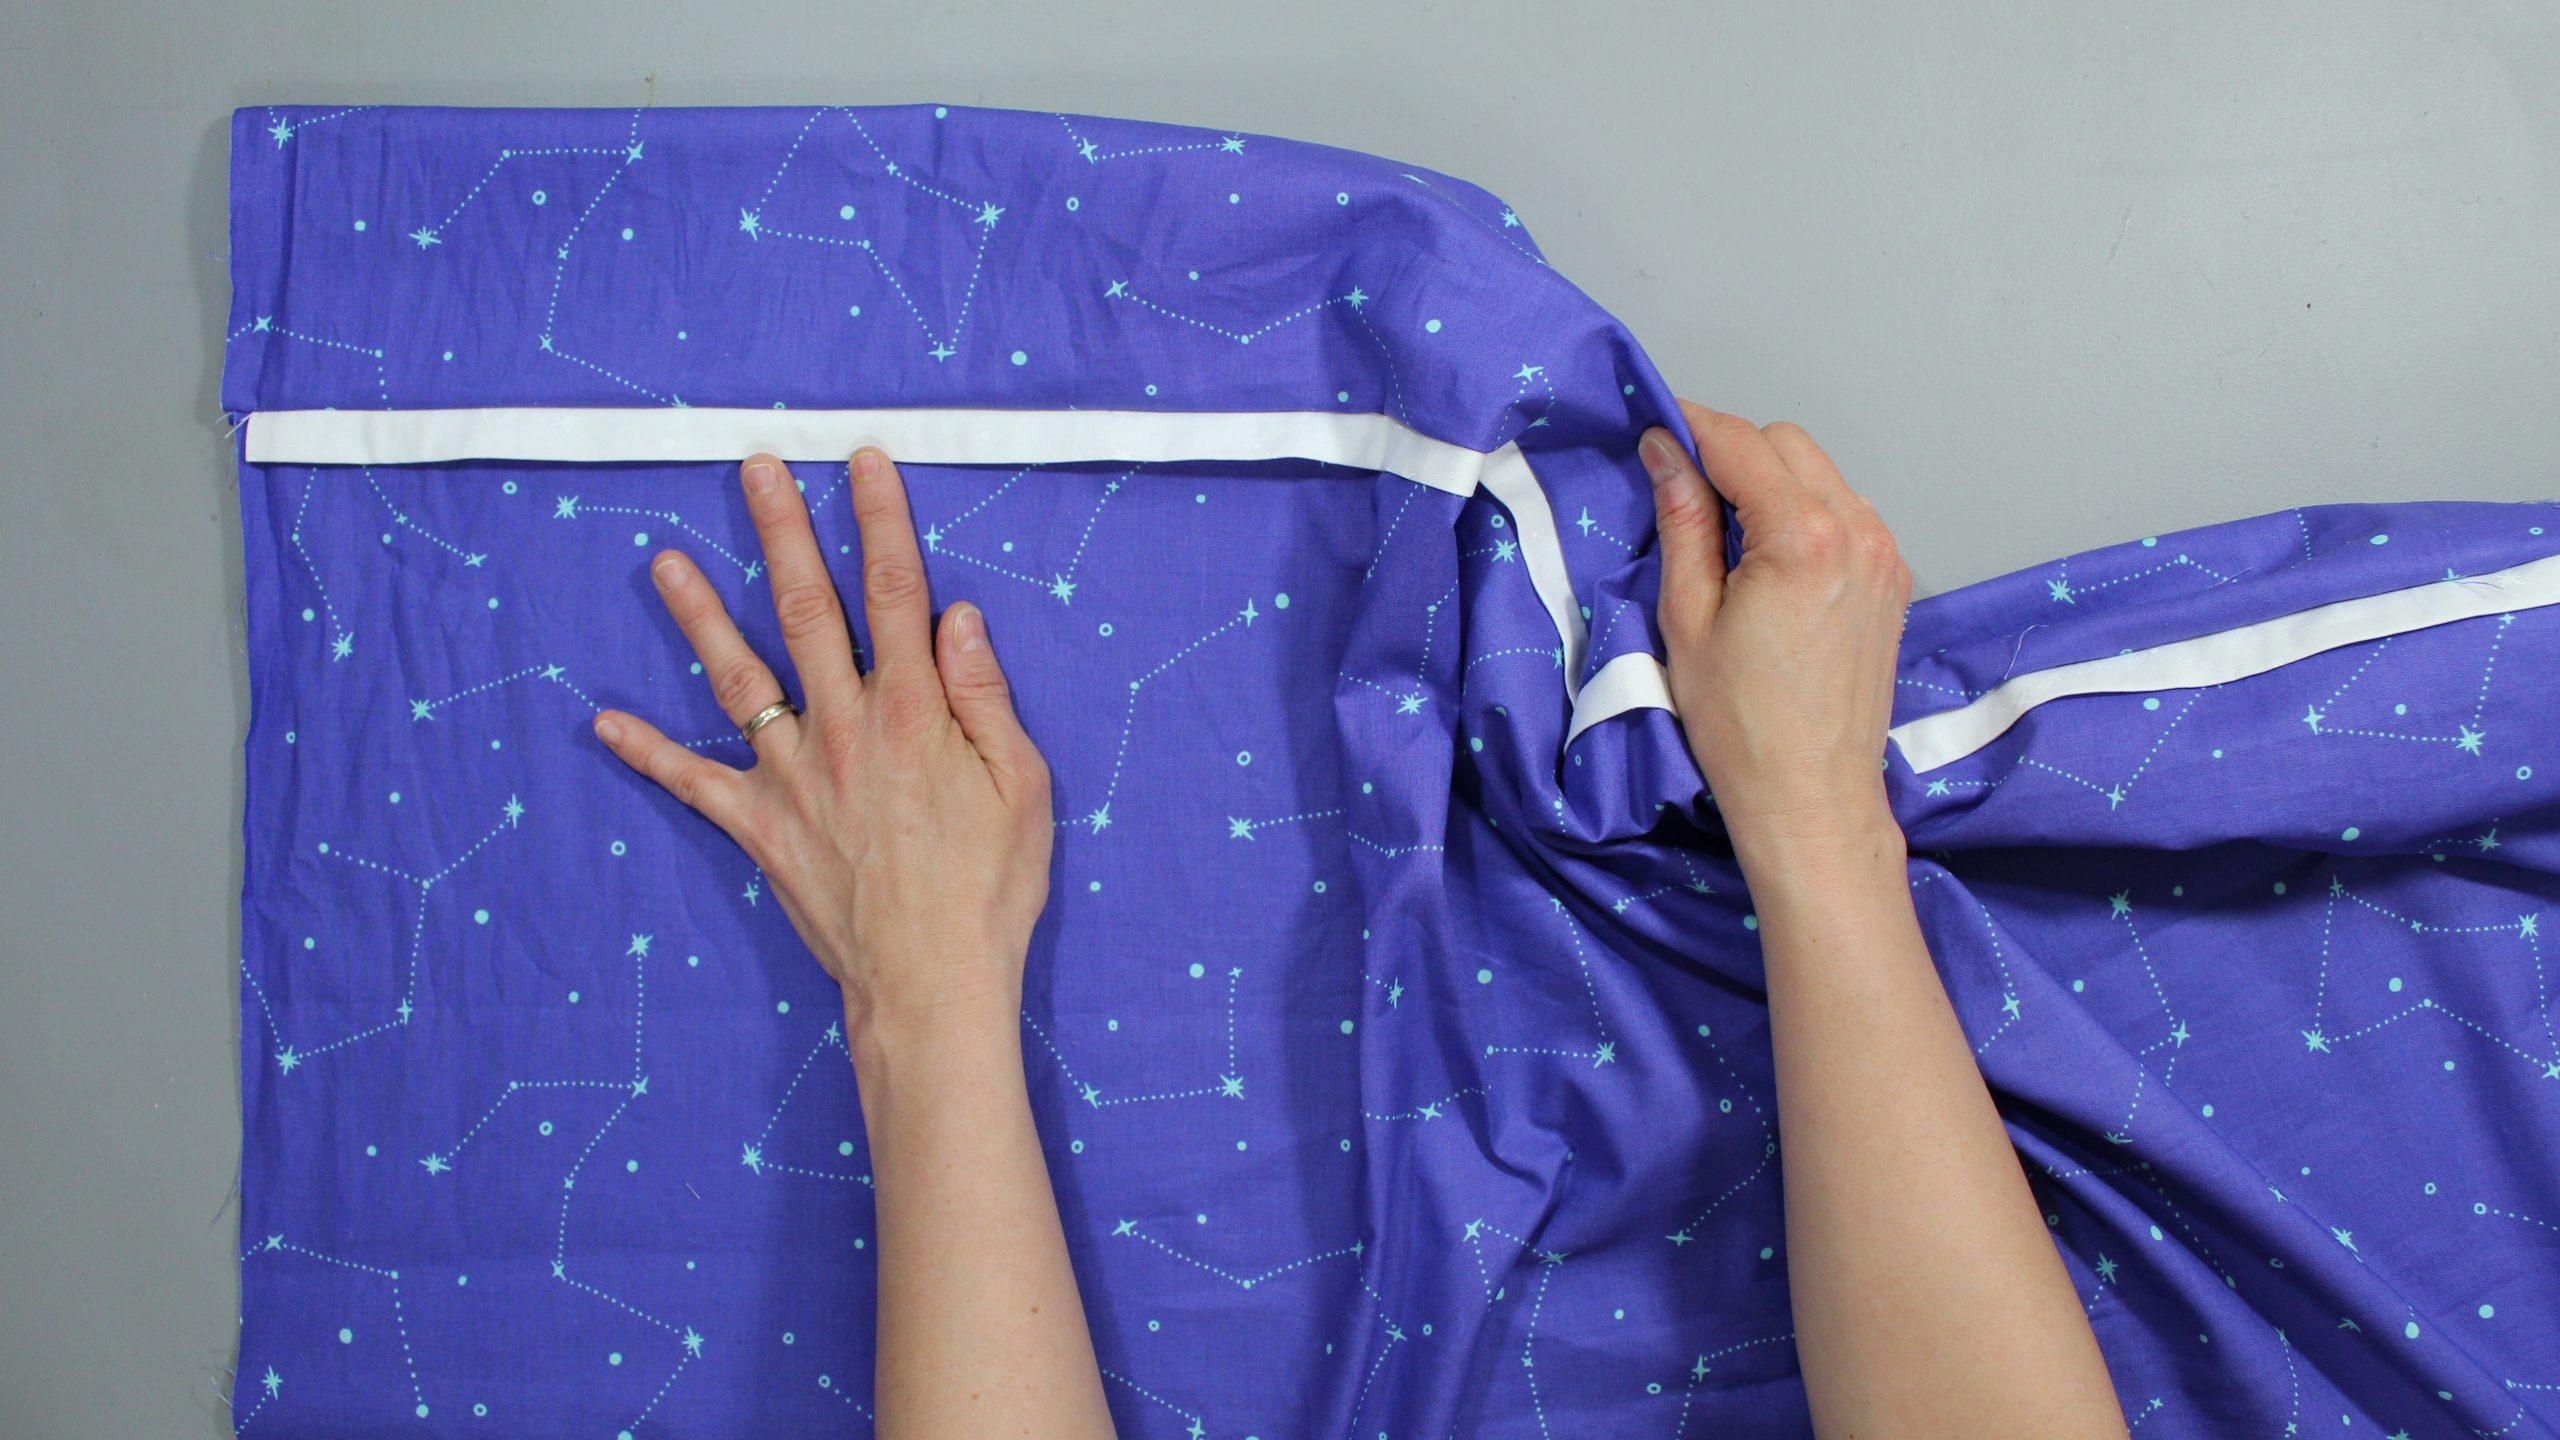 Opening sewn constellation fabric